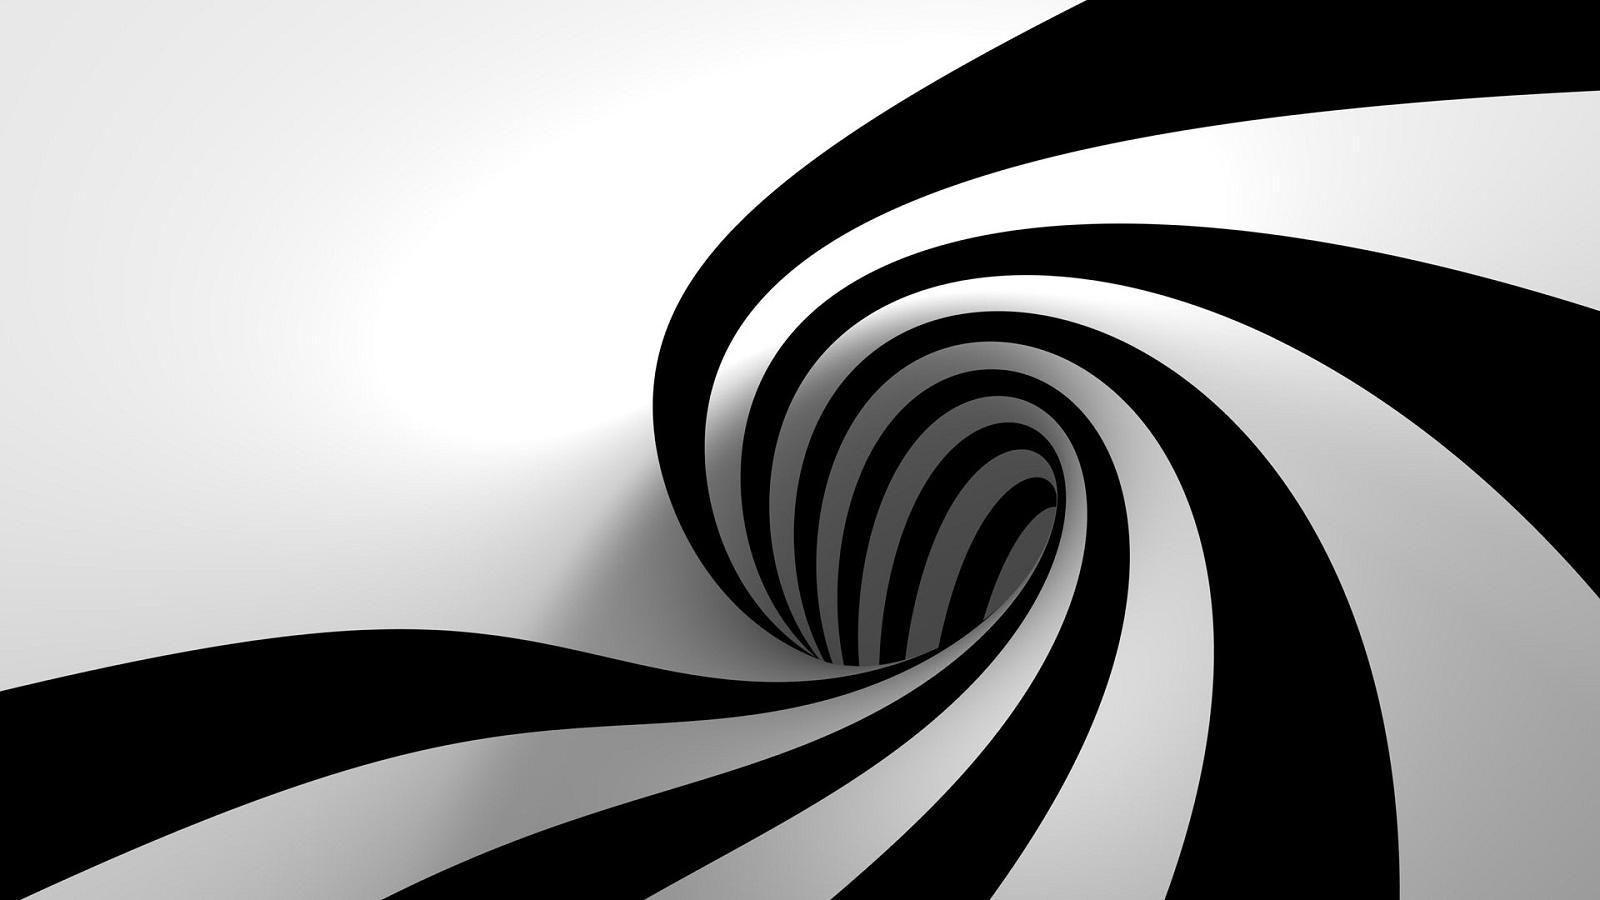 Http Wallpaper Share Wp Content Uploads Black And White Designwhite